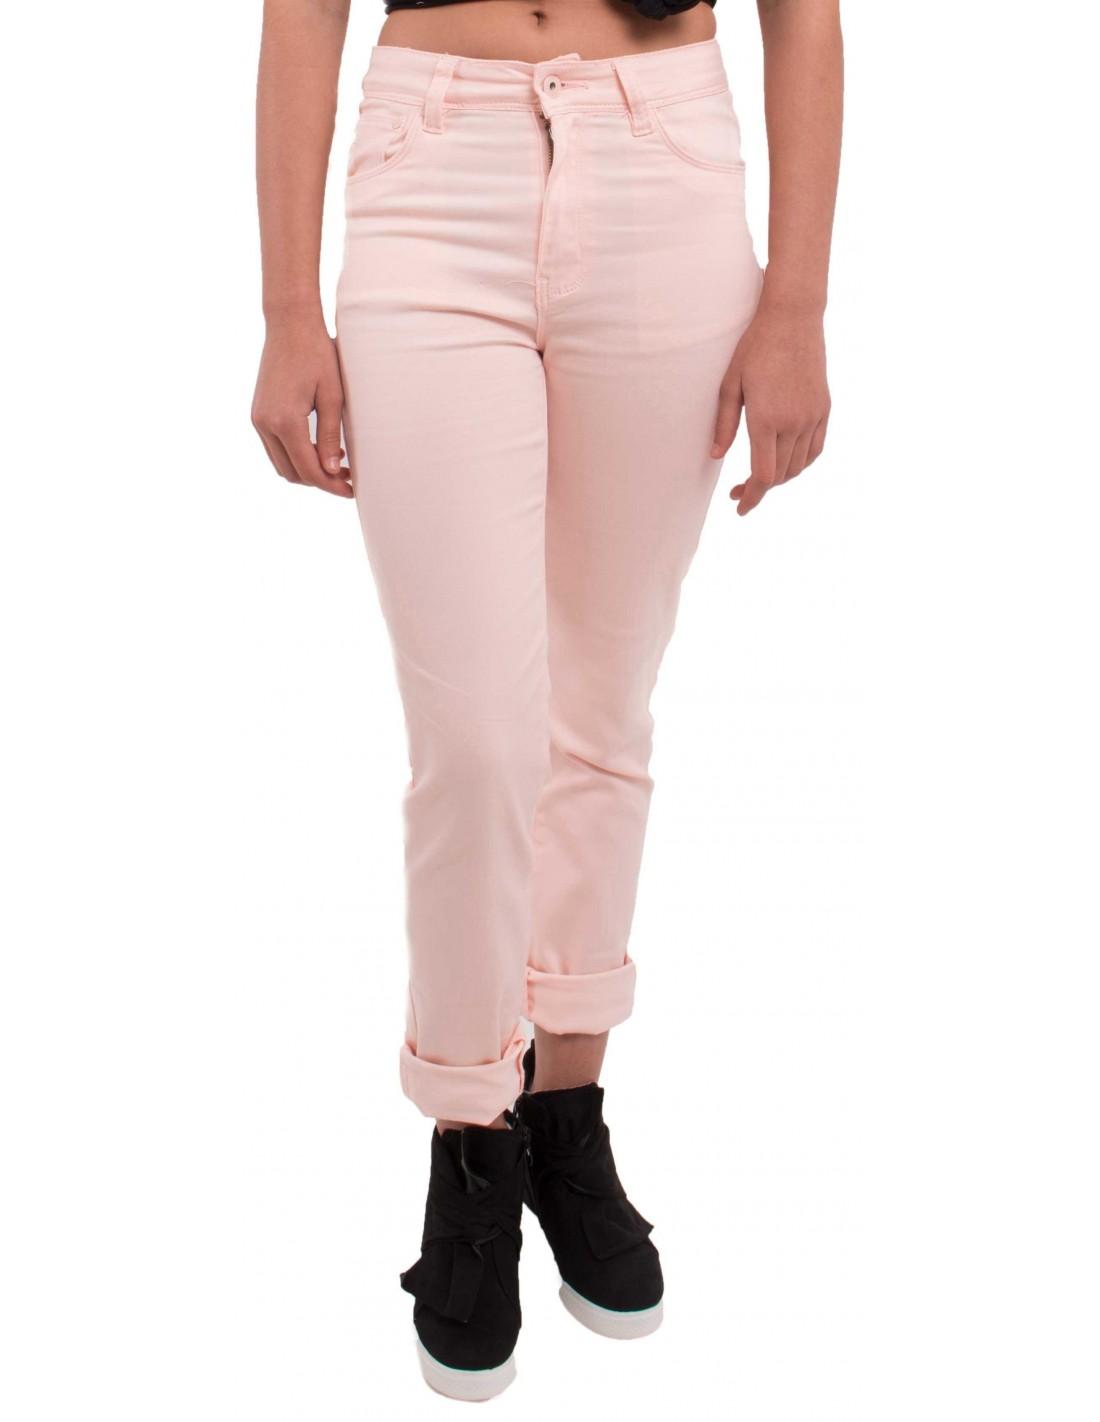 jean rose clair coupe droite taille haute type jean stretch avec revers. Black Bedroom Furniture Sets. Home Design Ideas